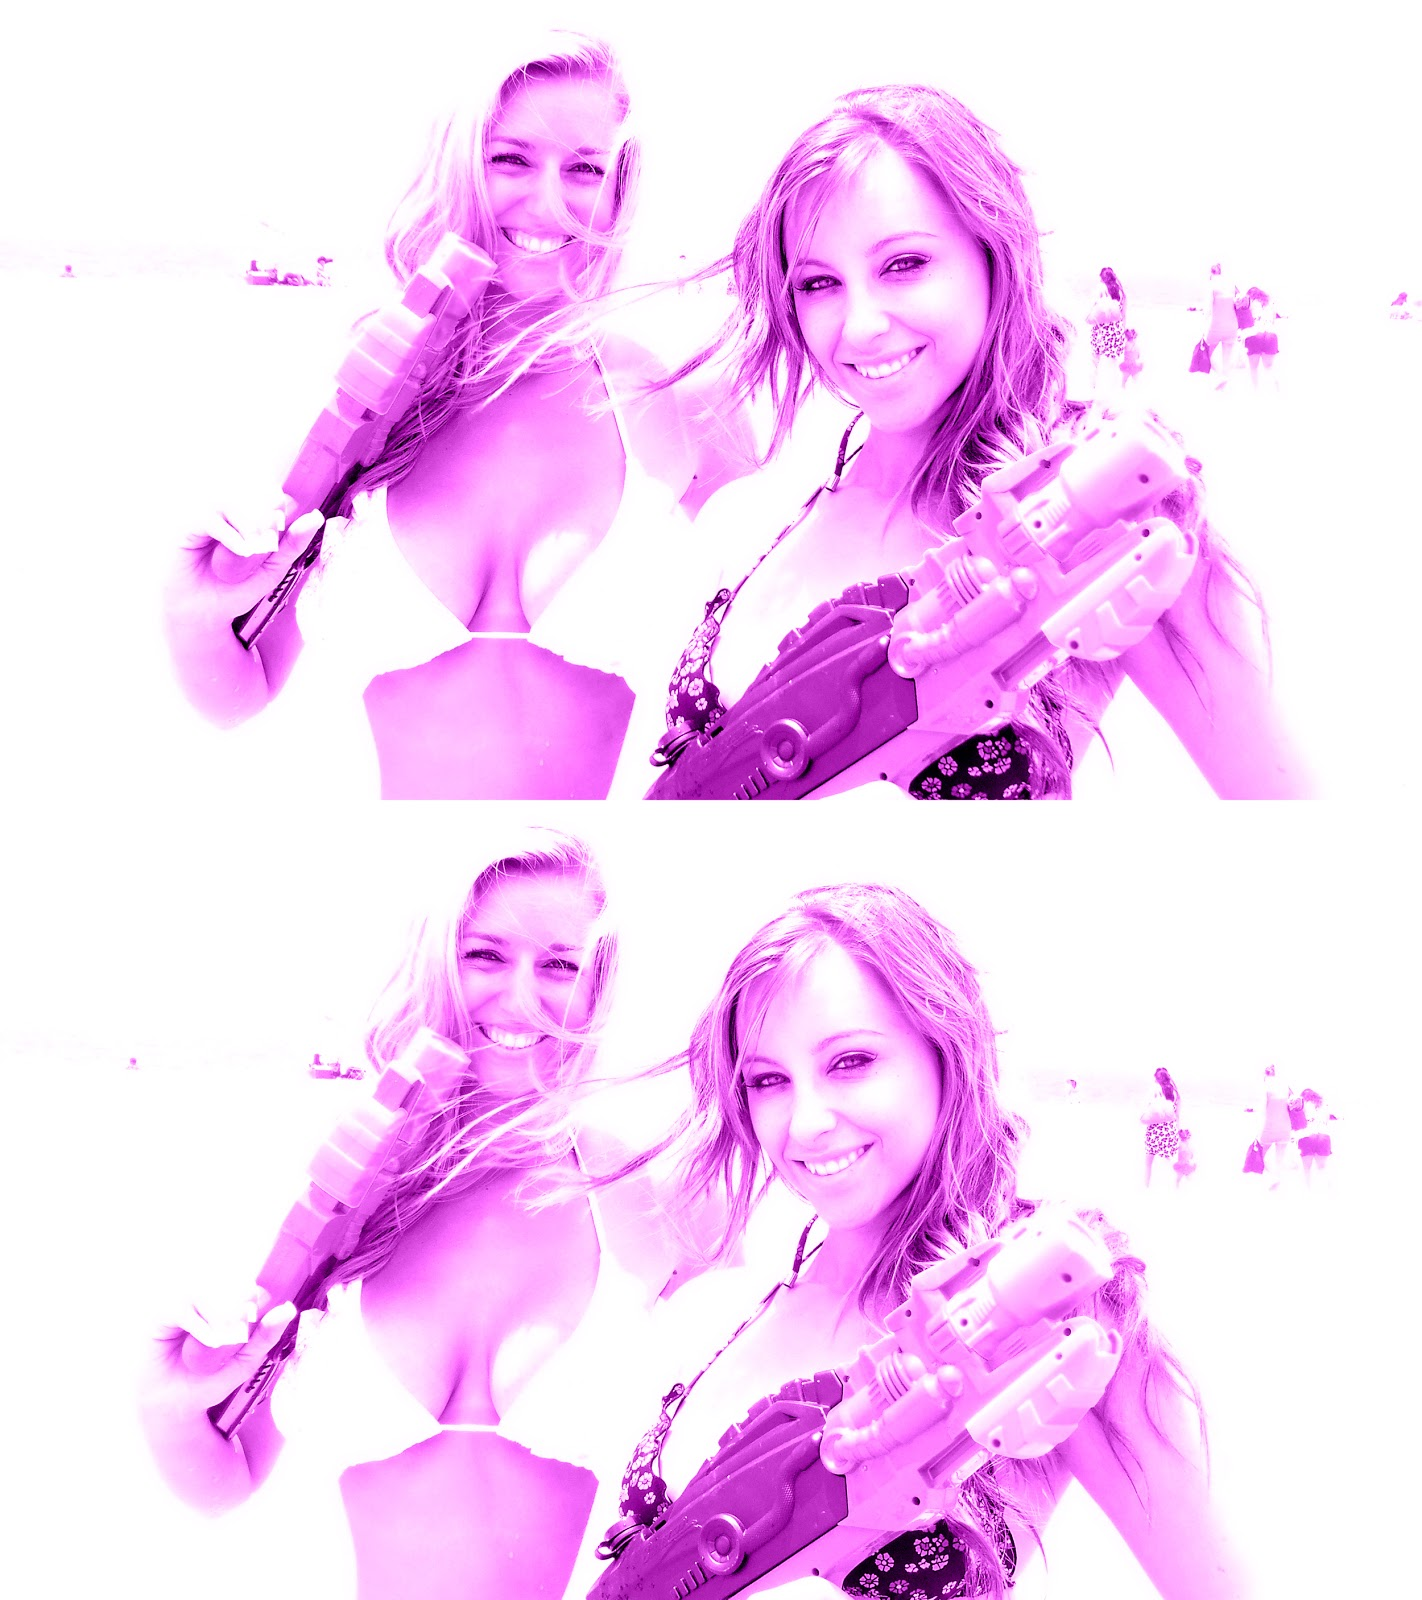 http://2.bp.blogspot.com/-4tY9LYtJrJA/UJmslFgcu1I/AAAAAAAAIQc/R_bMOWIyiGY/s1600/Bikini+Babes+3d+side+by+side+sbs+hd+Image02.jpg